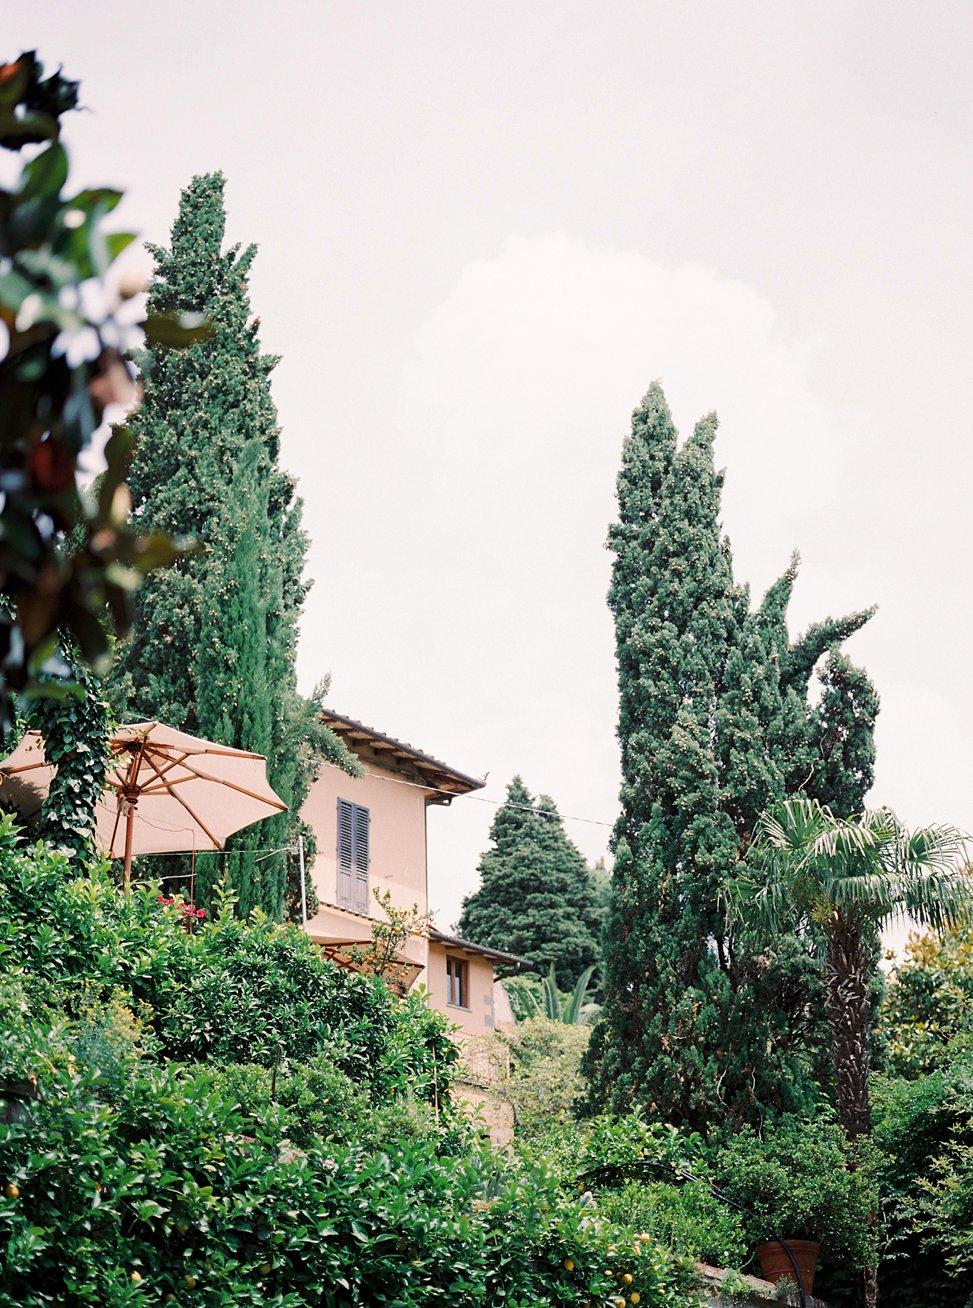 Amanda-Drost-photography-wedding-italy-Villa-sermolli-tuscany_0016.jpg